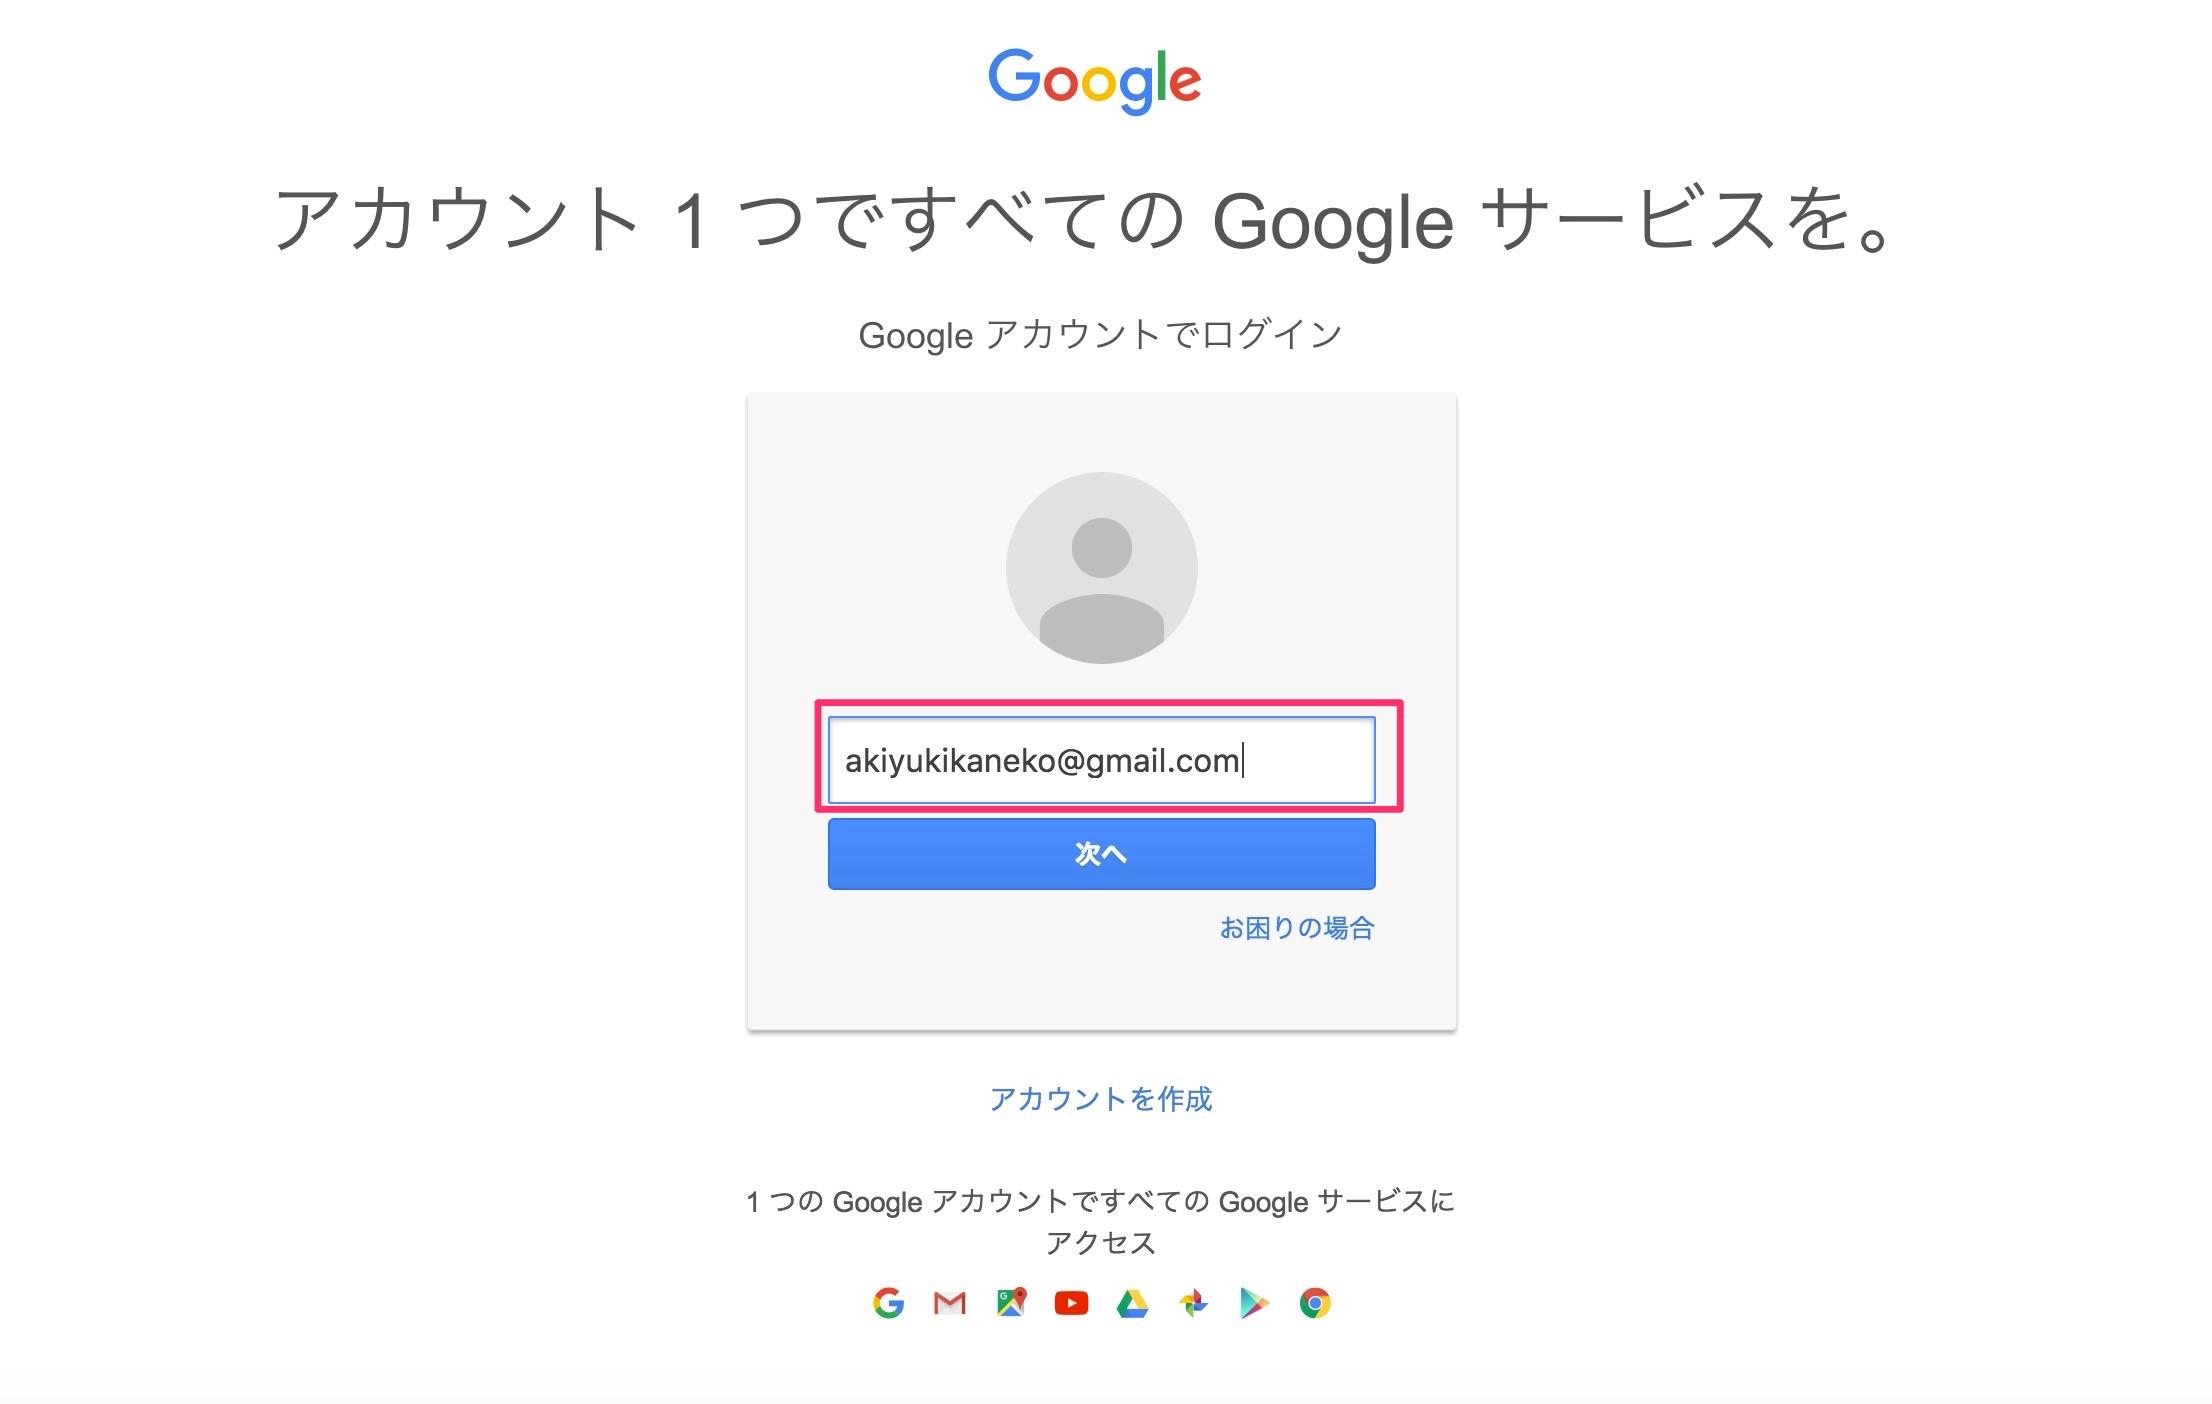 googleにログインする方法1